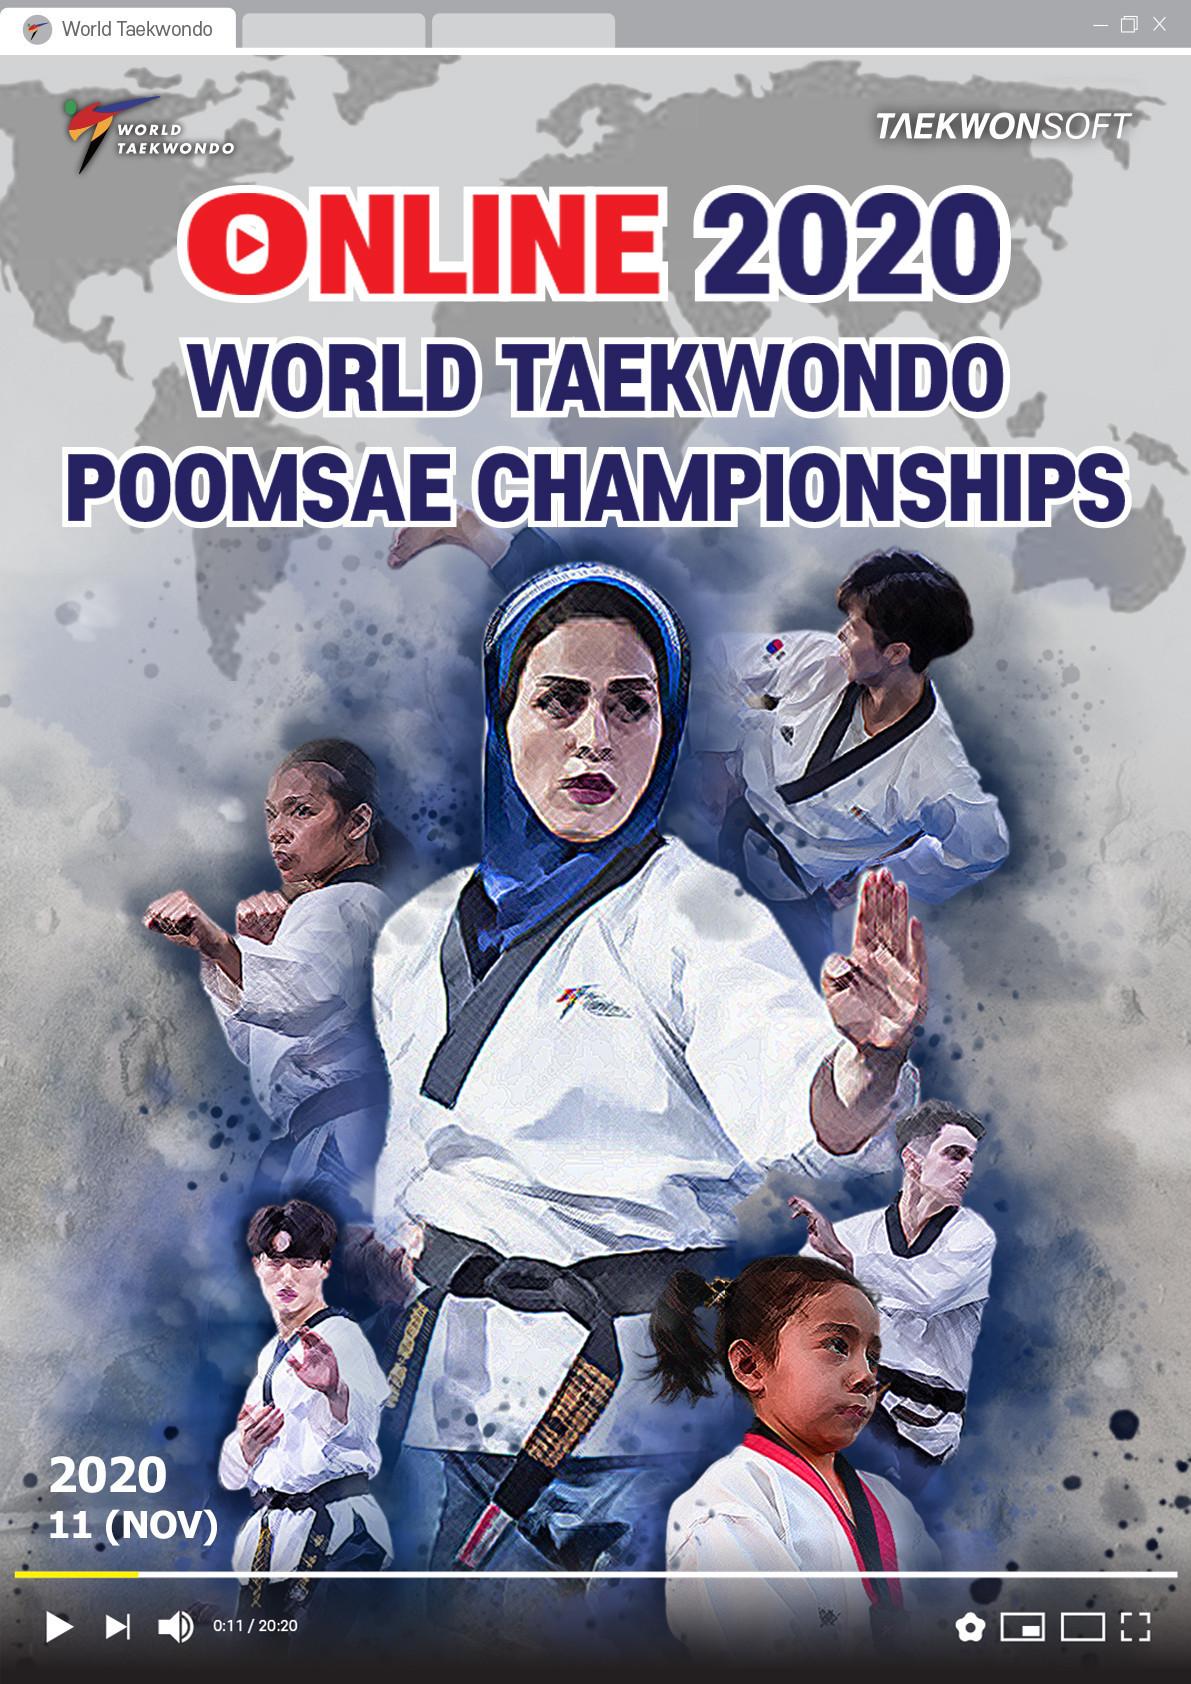 "World Taekwondo has announced that its inaugural Online World Taekwondo Poomsae Championships will be ""open to all"" from November 15 ©World Taekwondo"